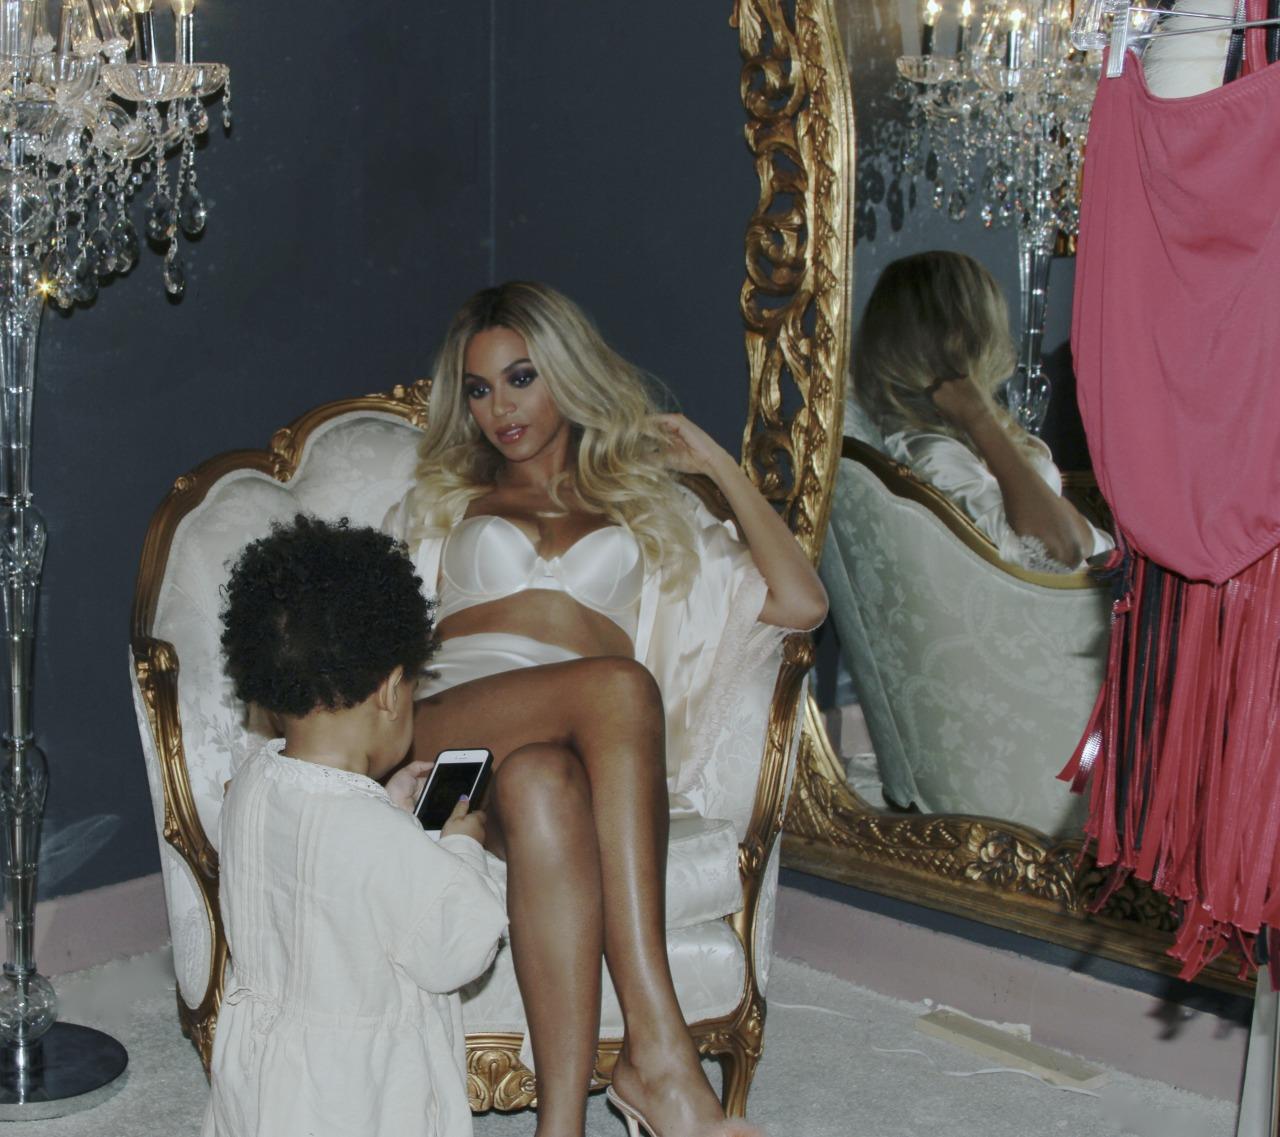 Beyoncé - Twitter (@Beyonce), Instagram (Baddiebey), Tumblr (I Am...) [II] - Página 2 Tumblr_n0i5d9LuzW1rqgjz2o1_1280